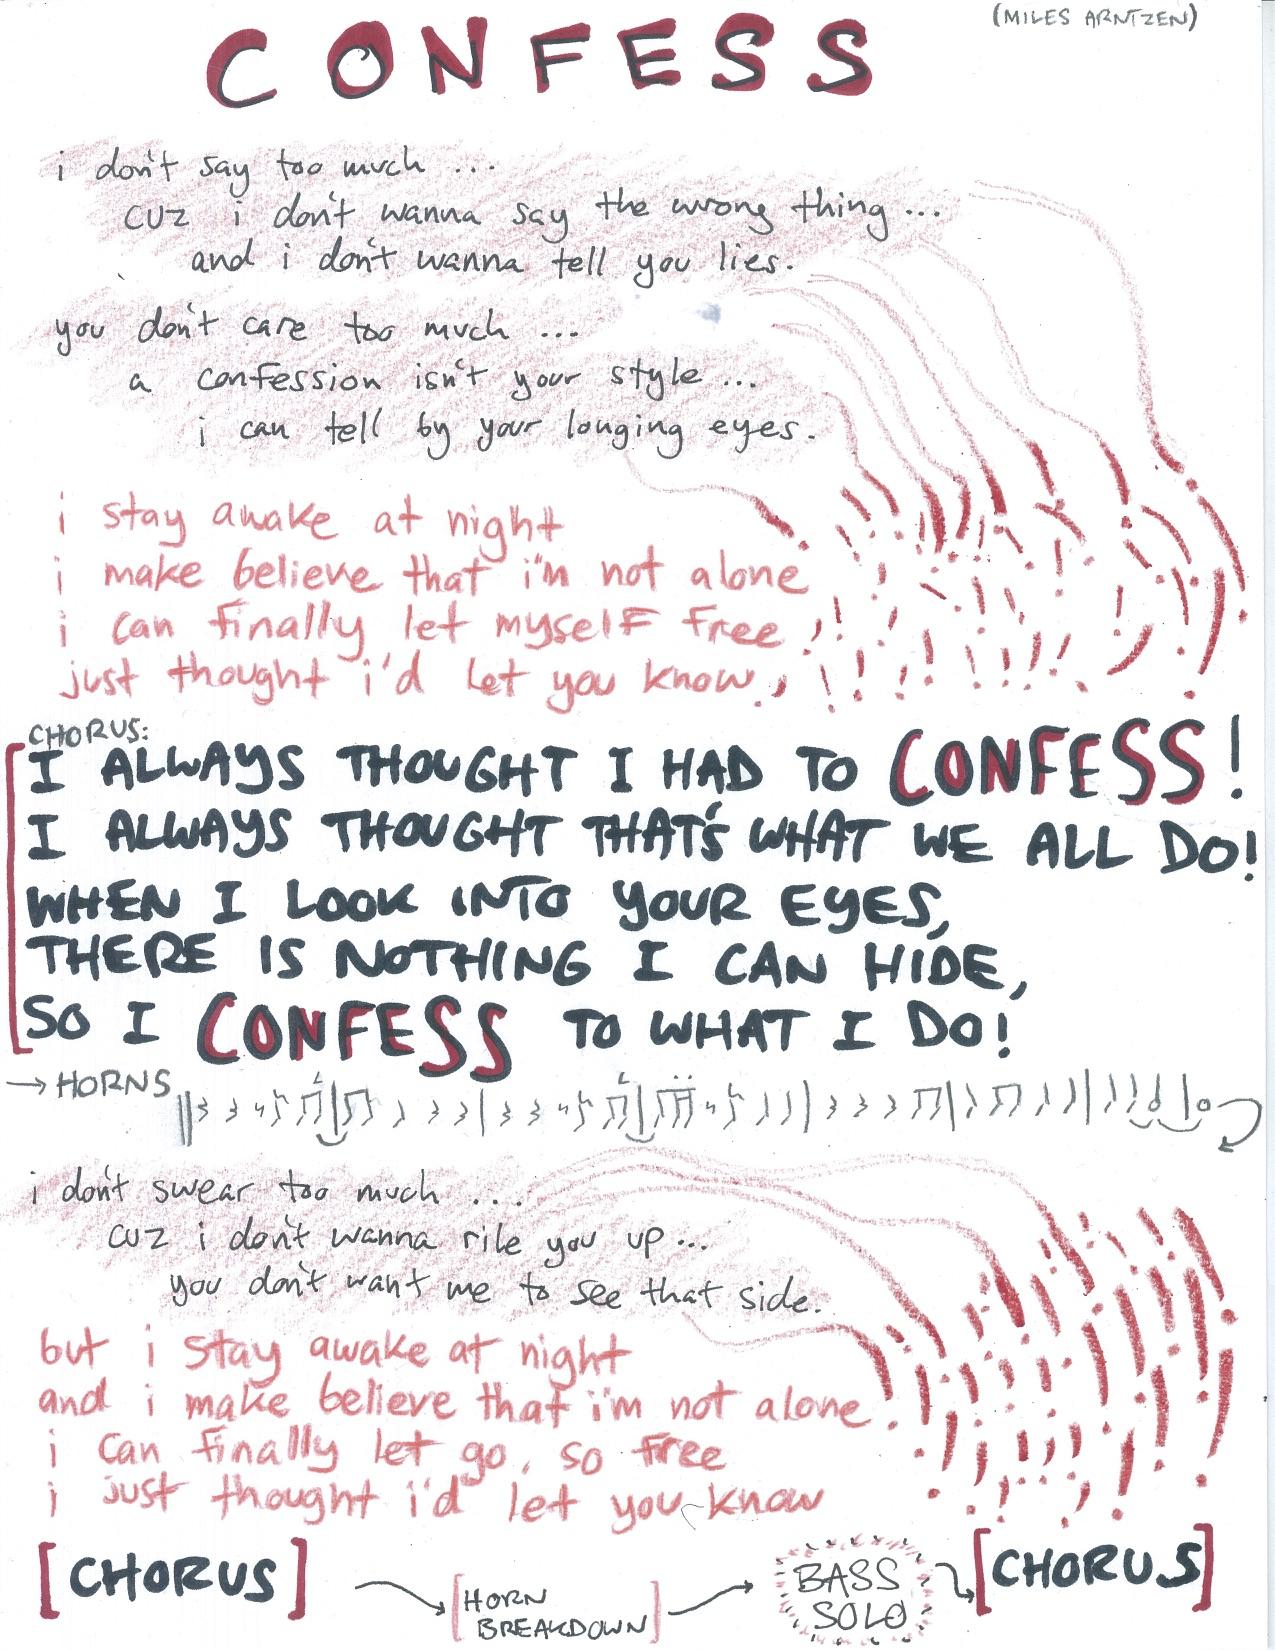 01 CONFESS : EMEFE.jpg